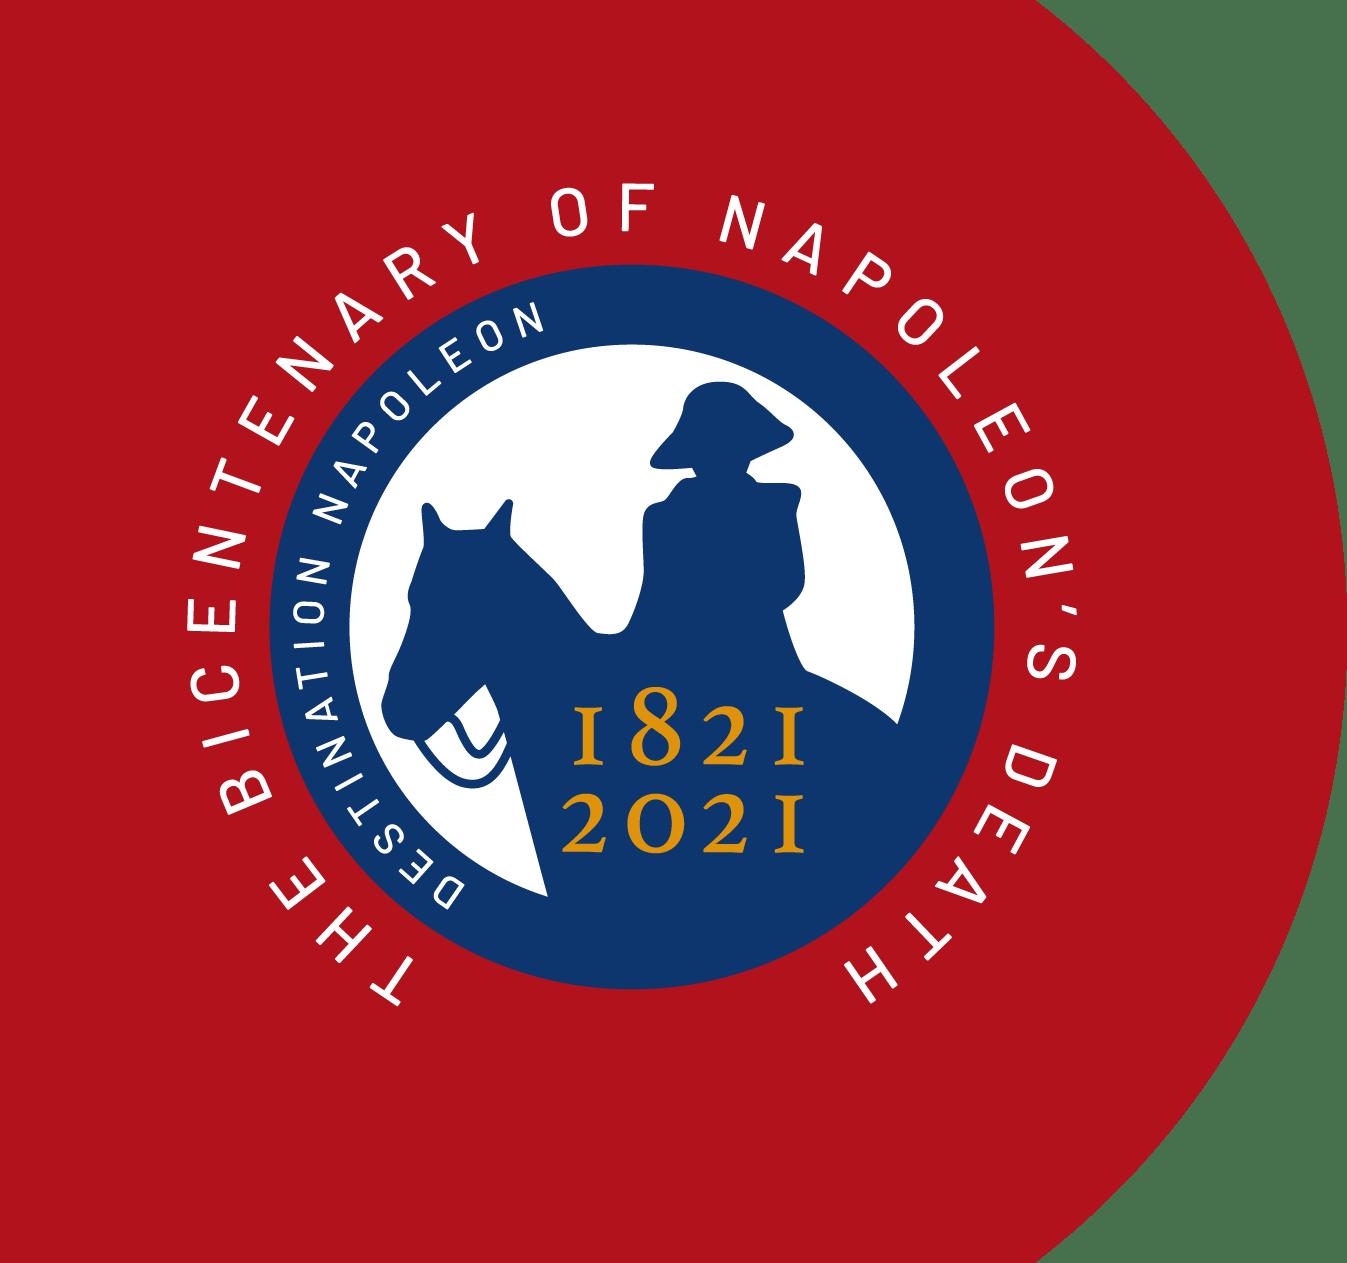 bicentenaire 2021